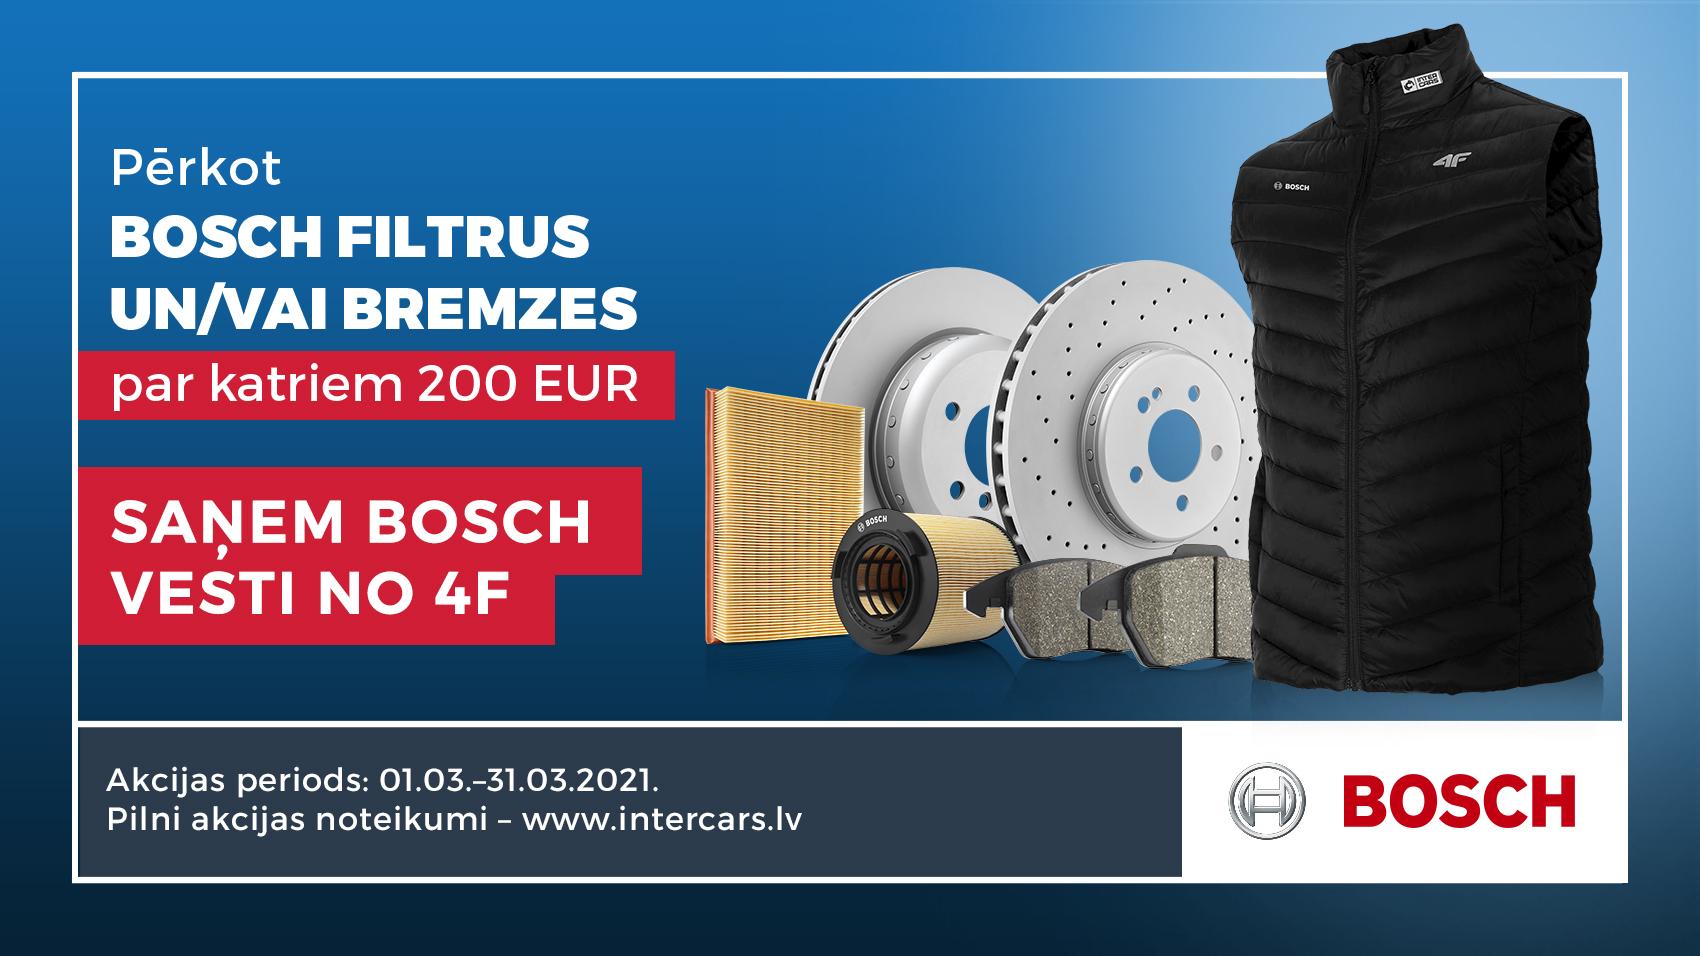 Bosch-akcija-mar2021screen.jpg